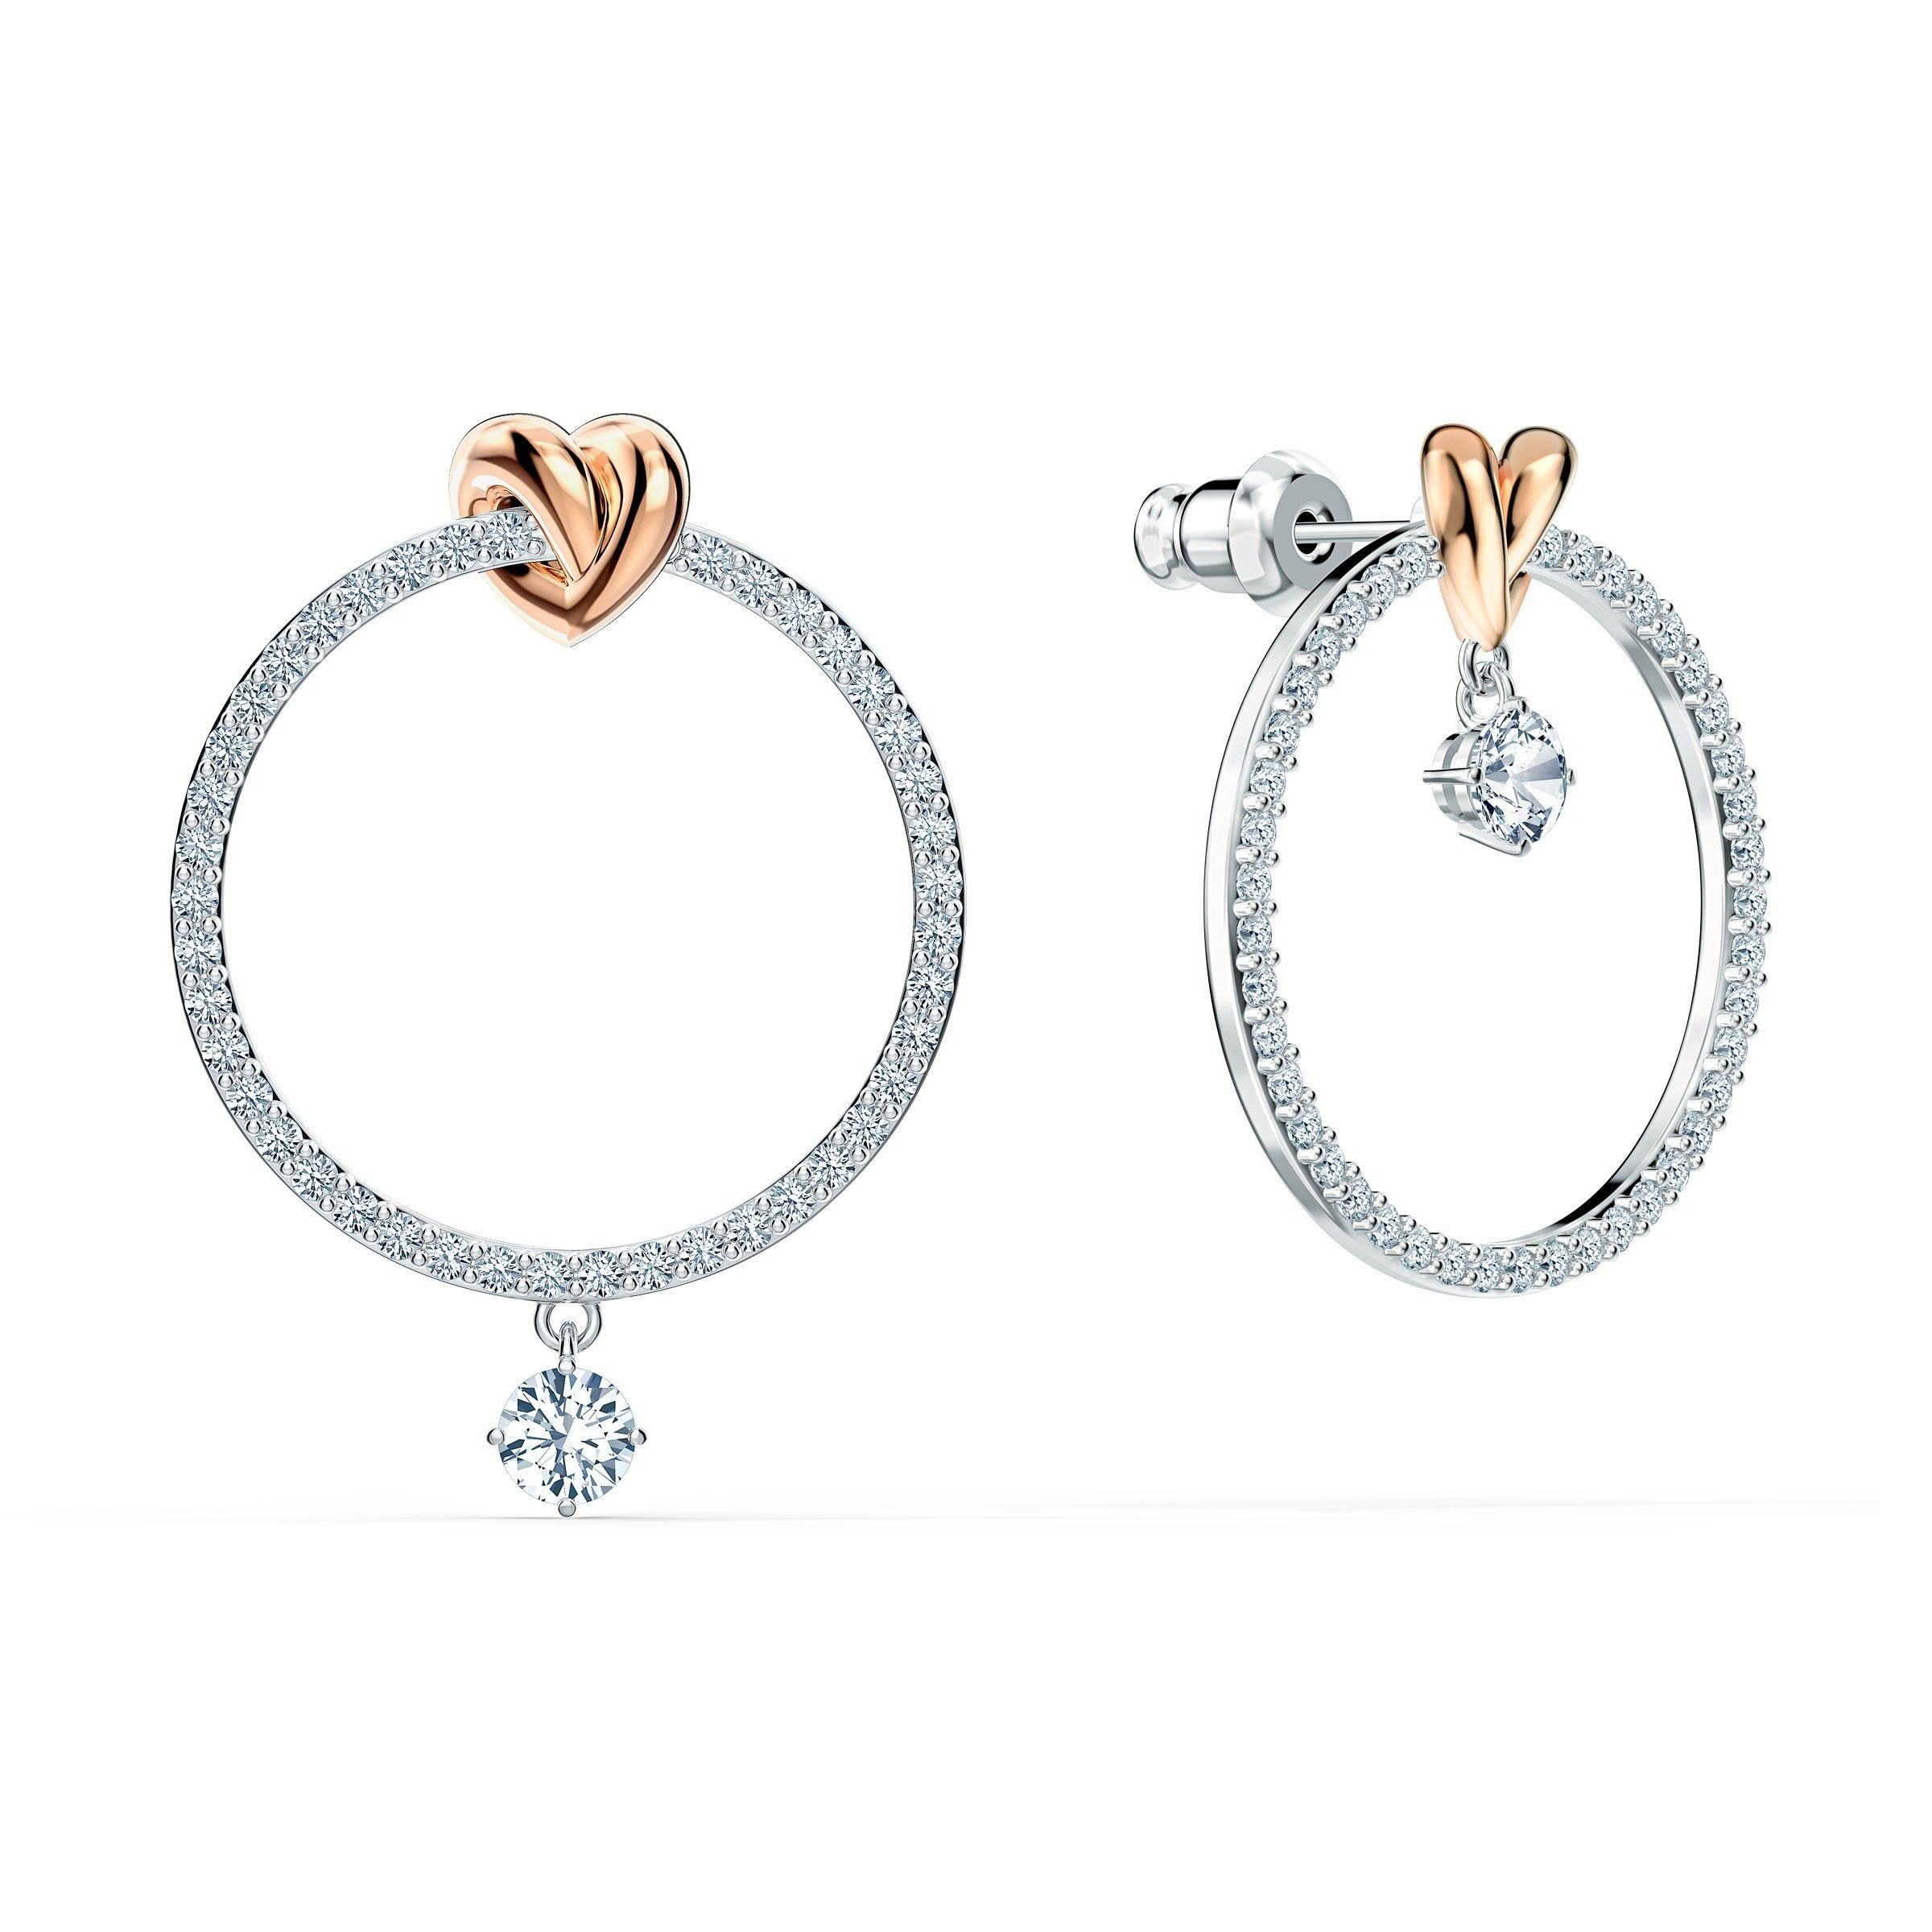 Swarovski Lifelong Heart Silver and Rose Gold Tone Hoop Earrings